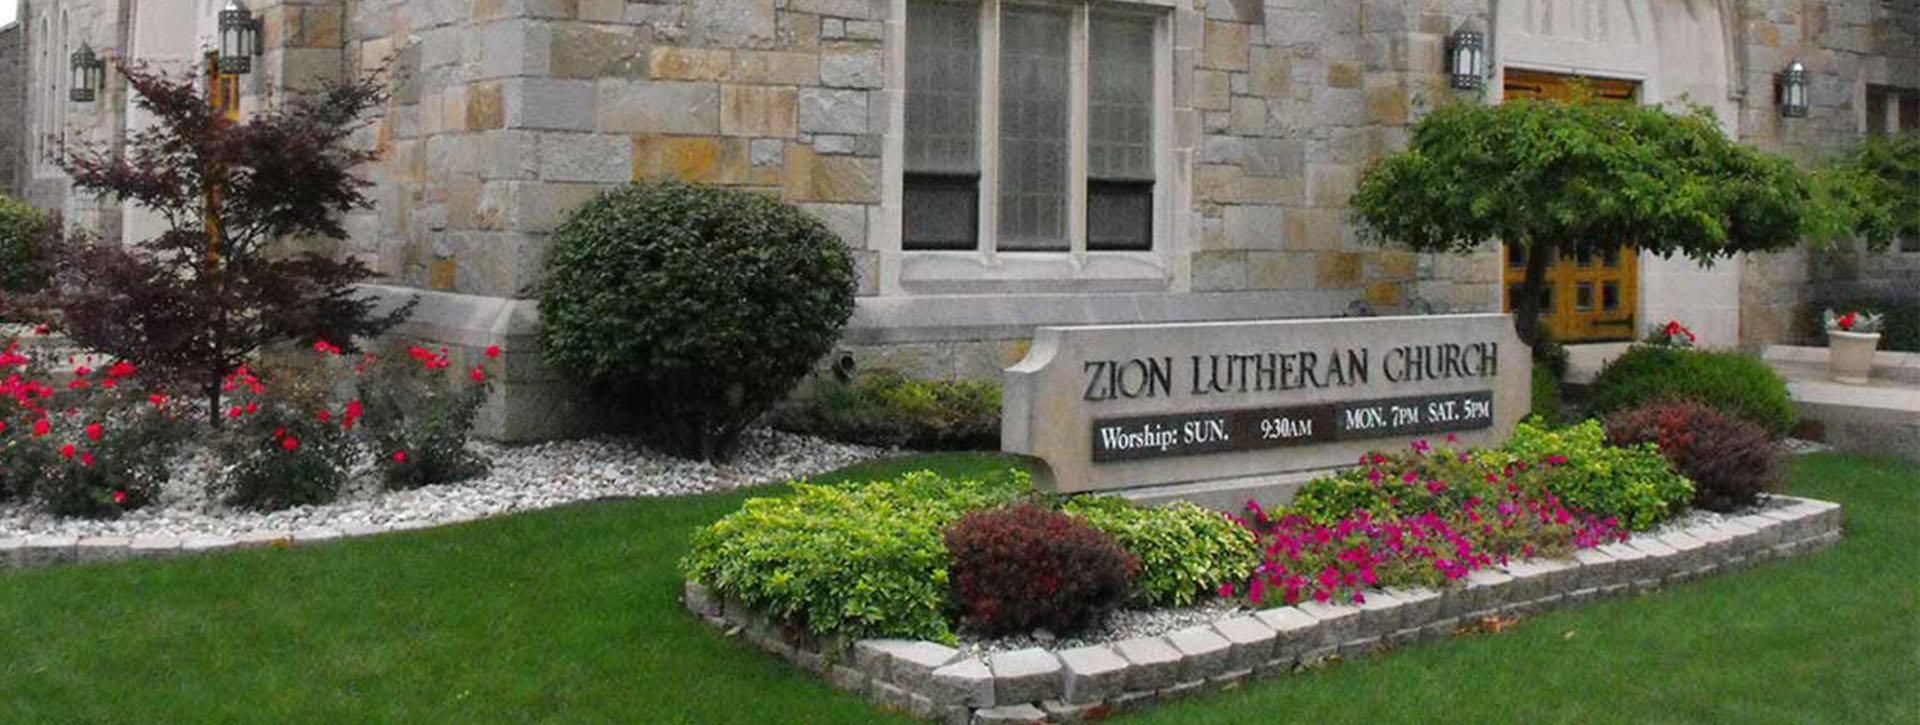 zion home banner 3